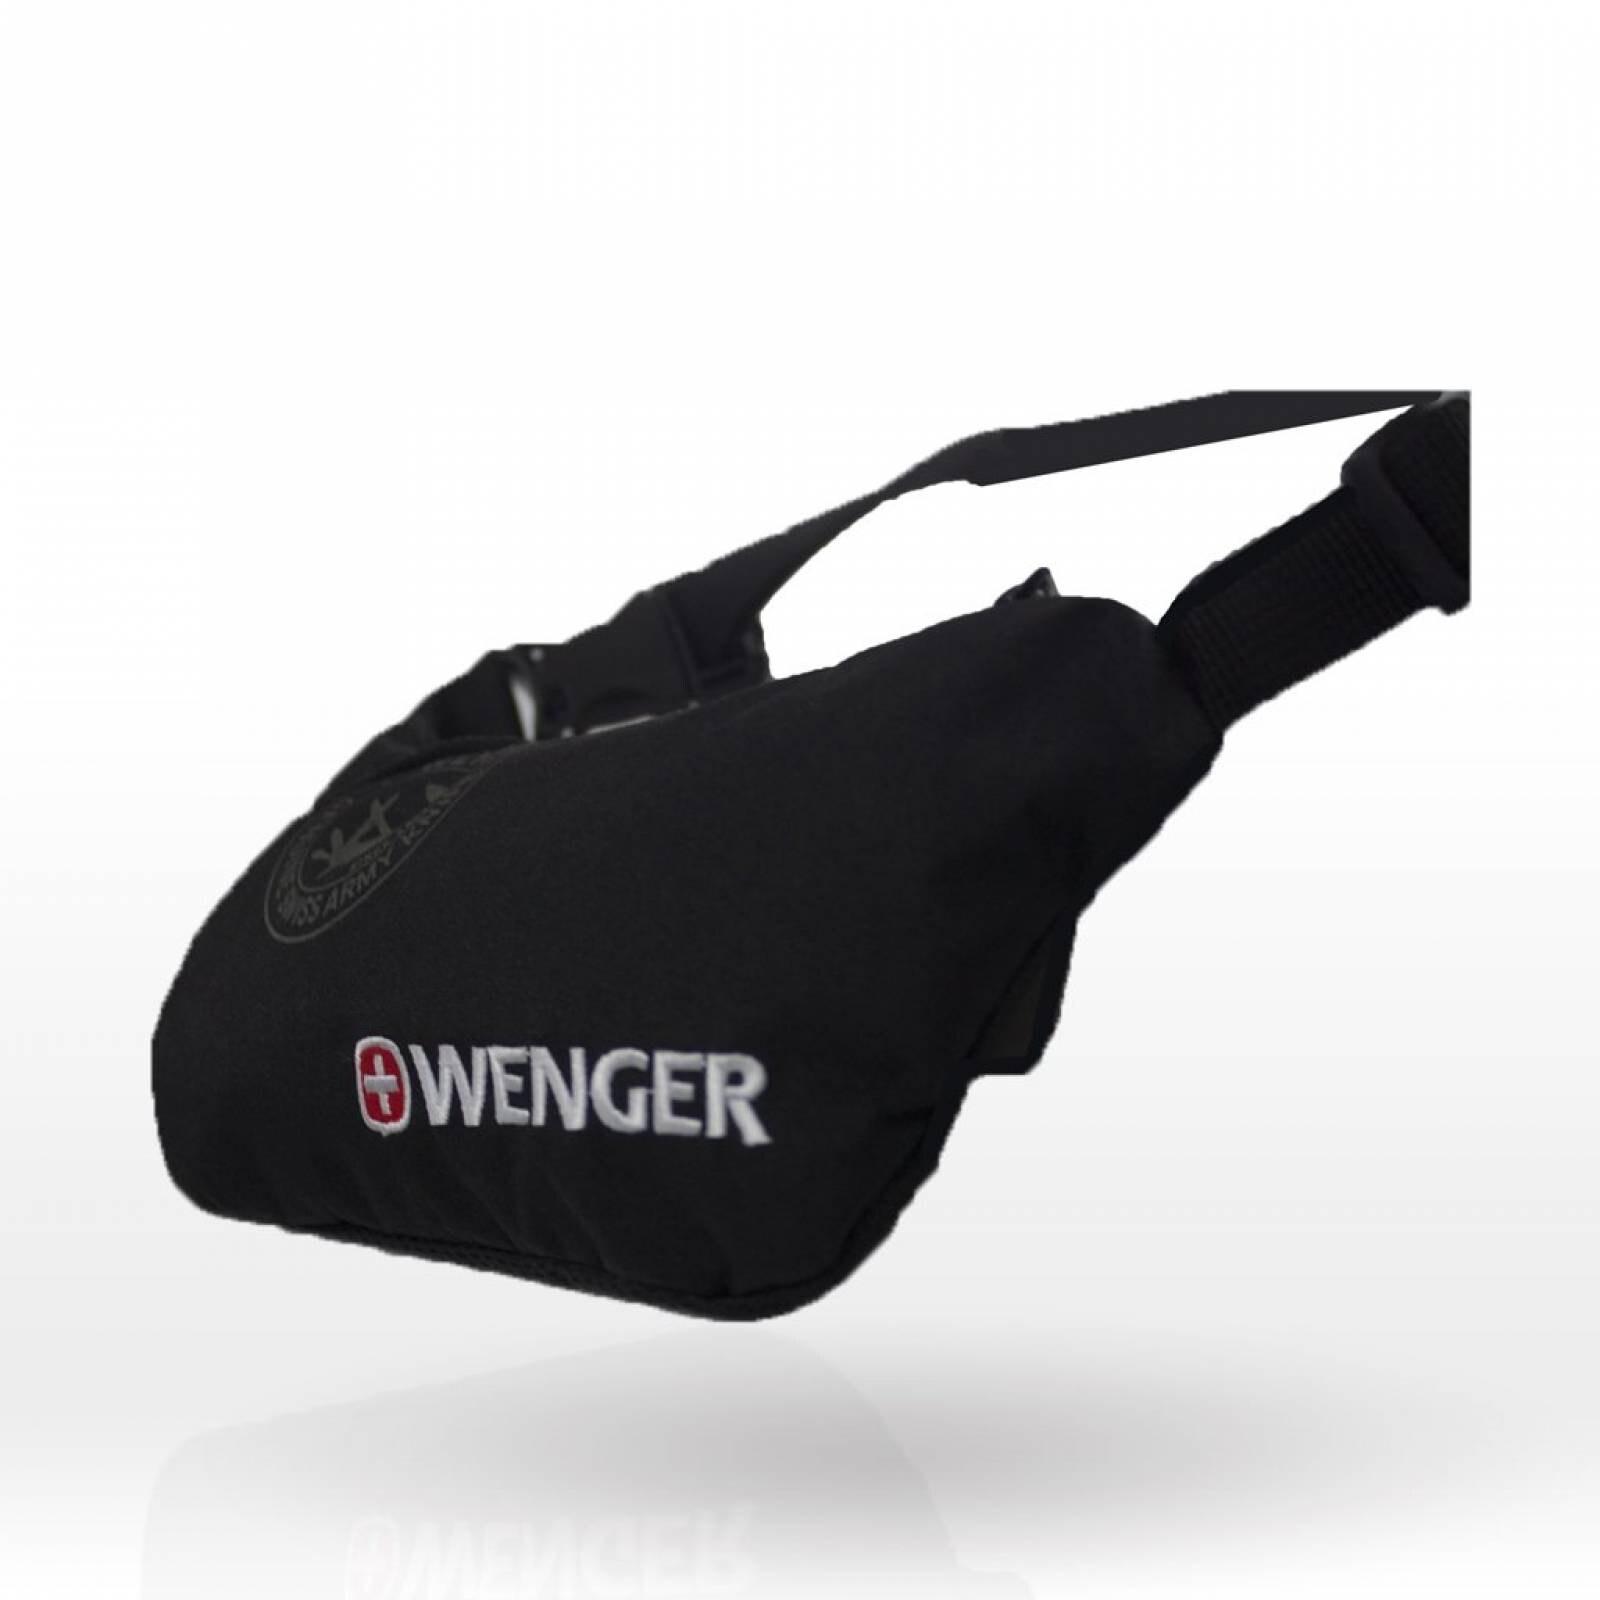 Cangurera black Wenger